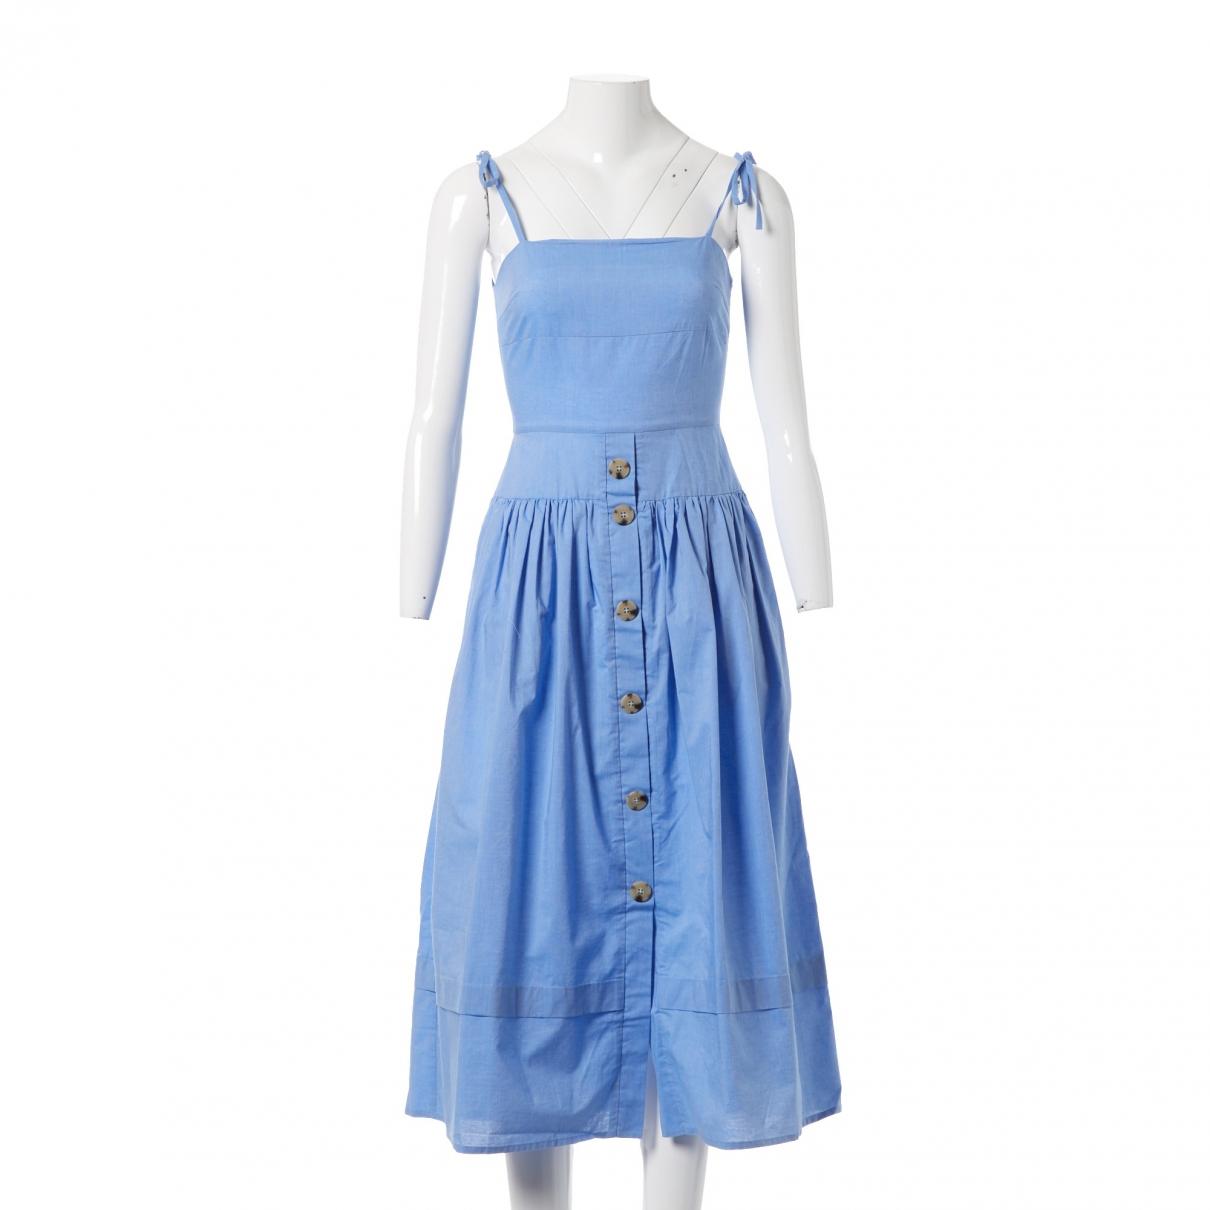 Rejina Pyo X Vestiaire Collective \N Blue Cotton dress for Women 8 UK